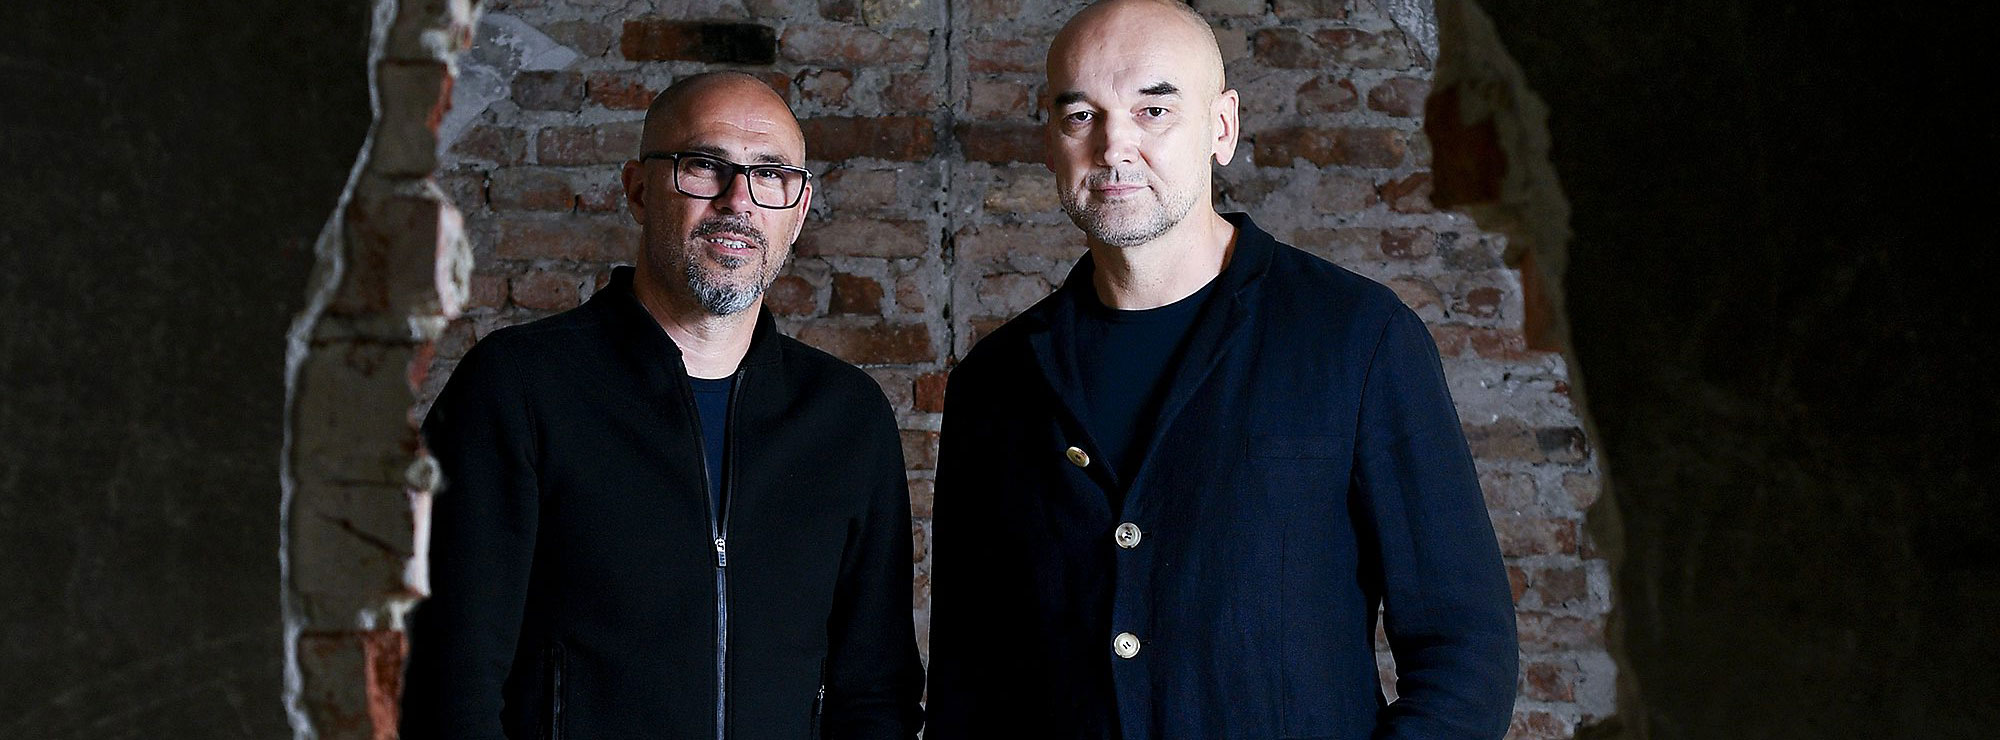 Tomislav Curkovic and Zoran Zidaric of Dva Arhitekta